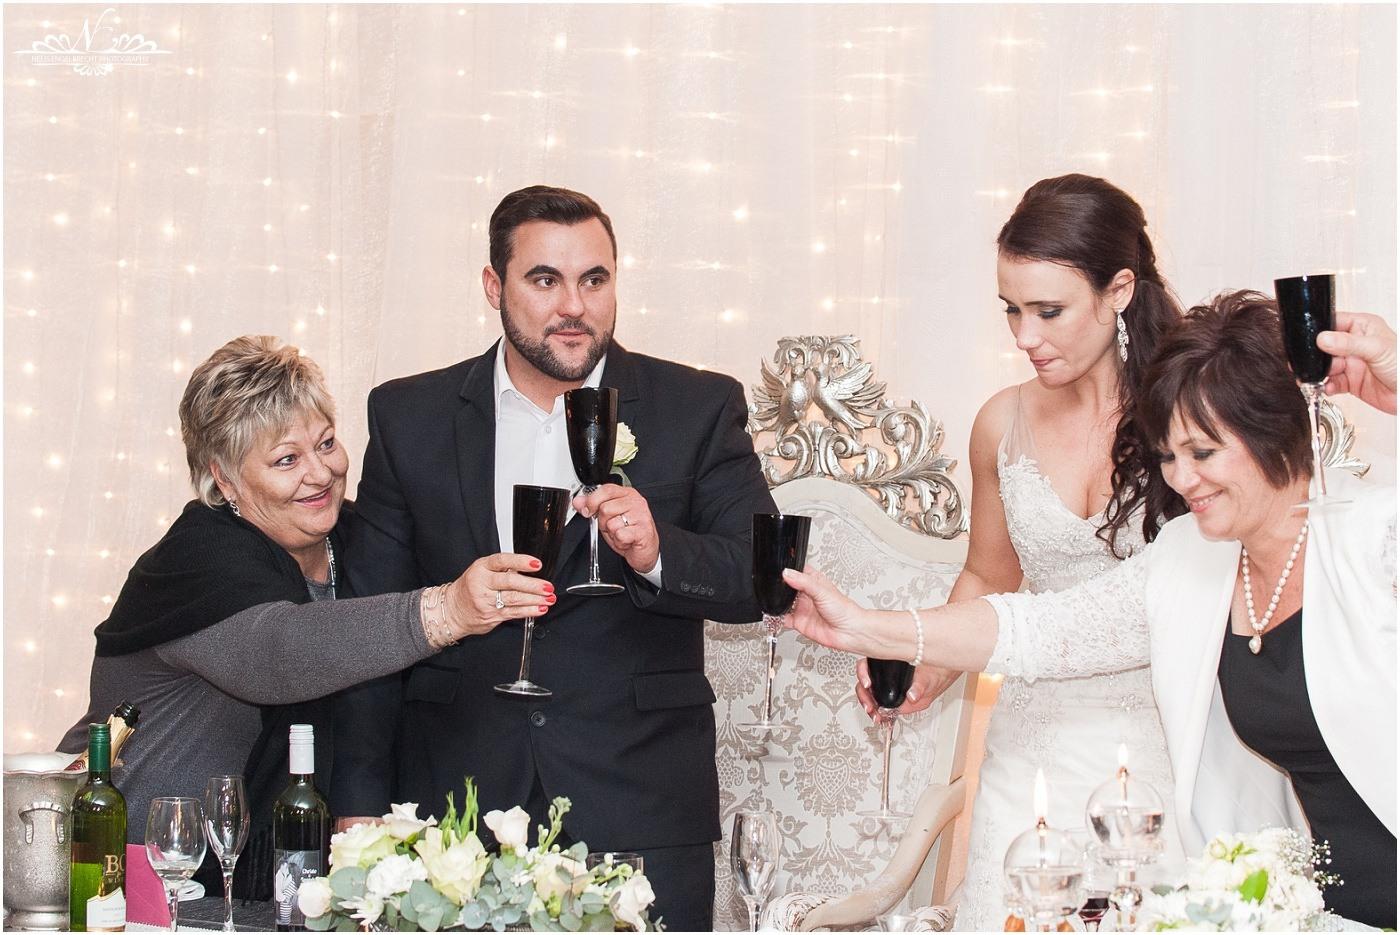 Eensgezind-Wedding-Photos-Nelis-Engelbrecht-Photography-180